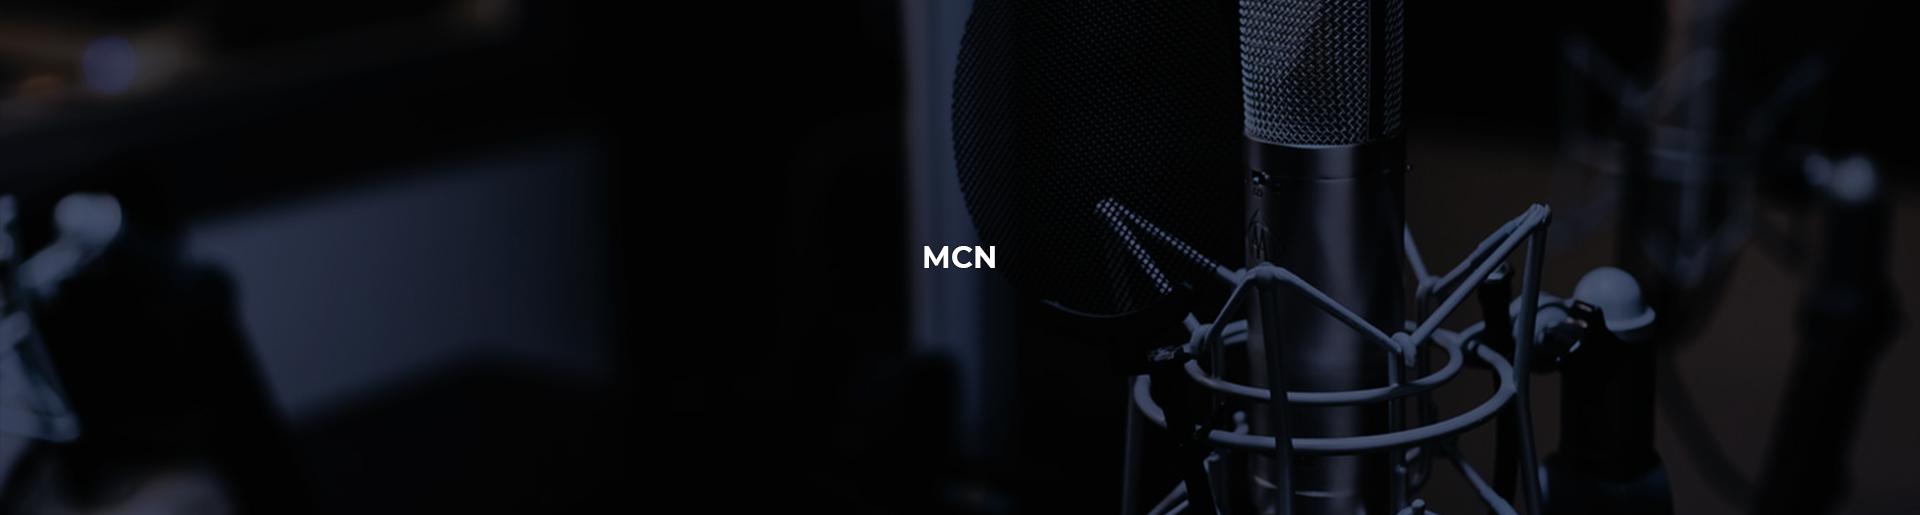 mcn_t.jpg